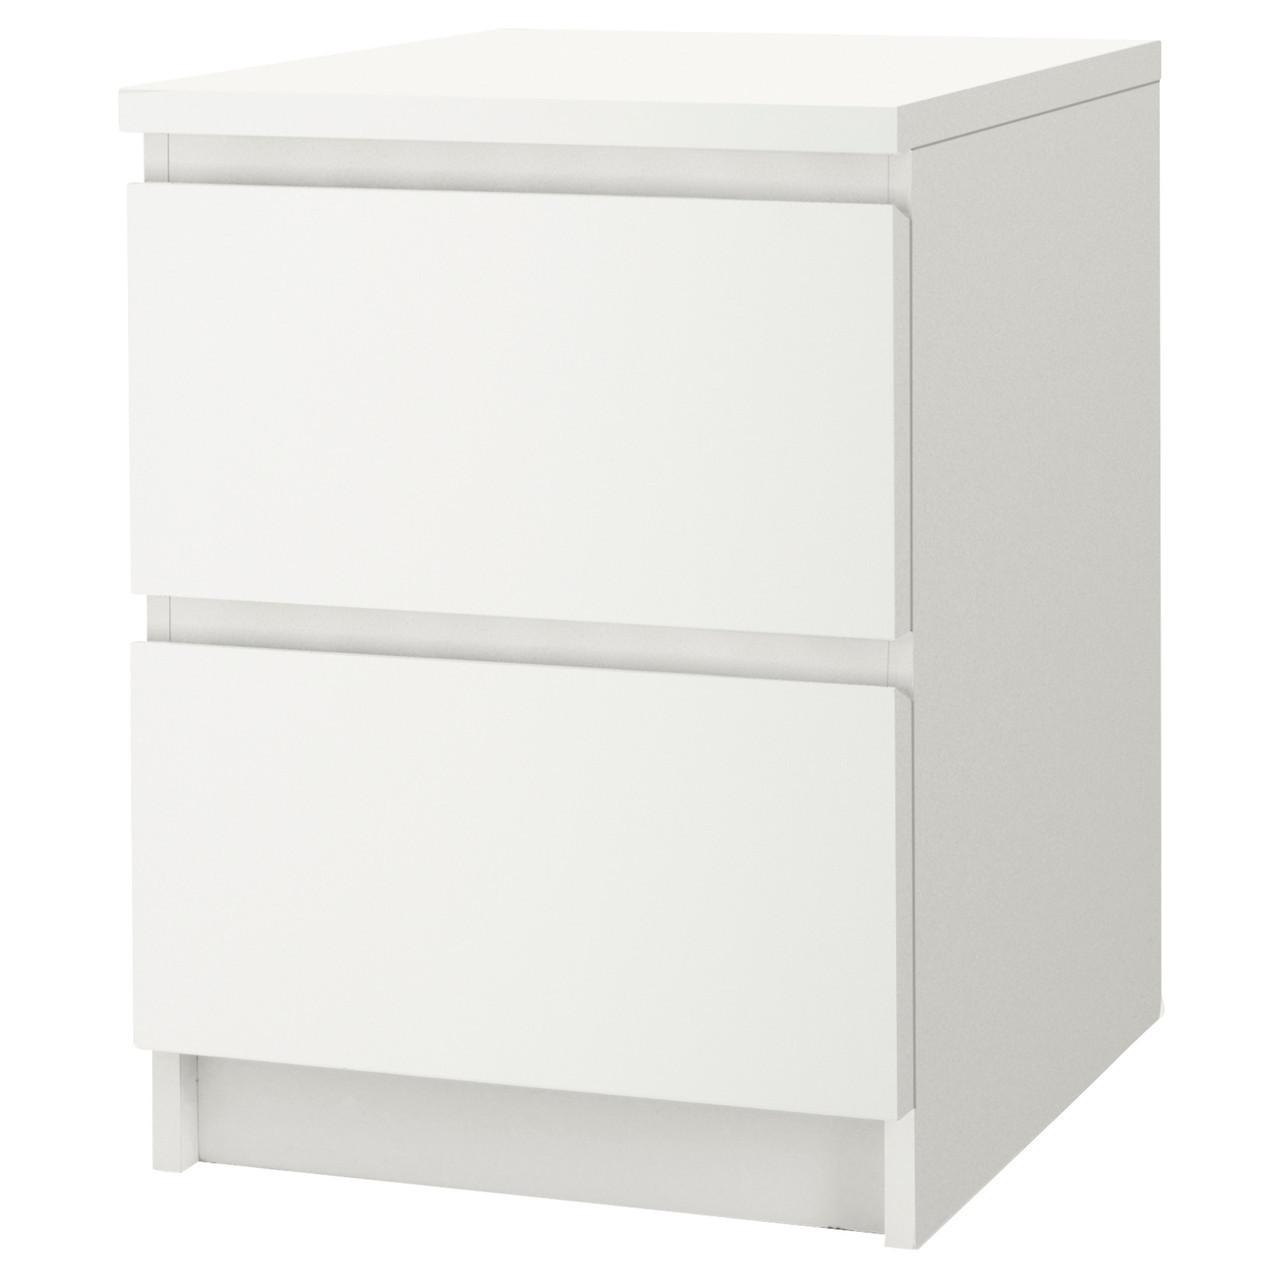 MALM Комод с 2 ящиками, белый 802.145.49